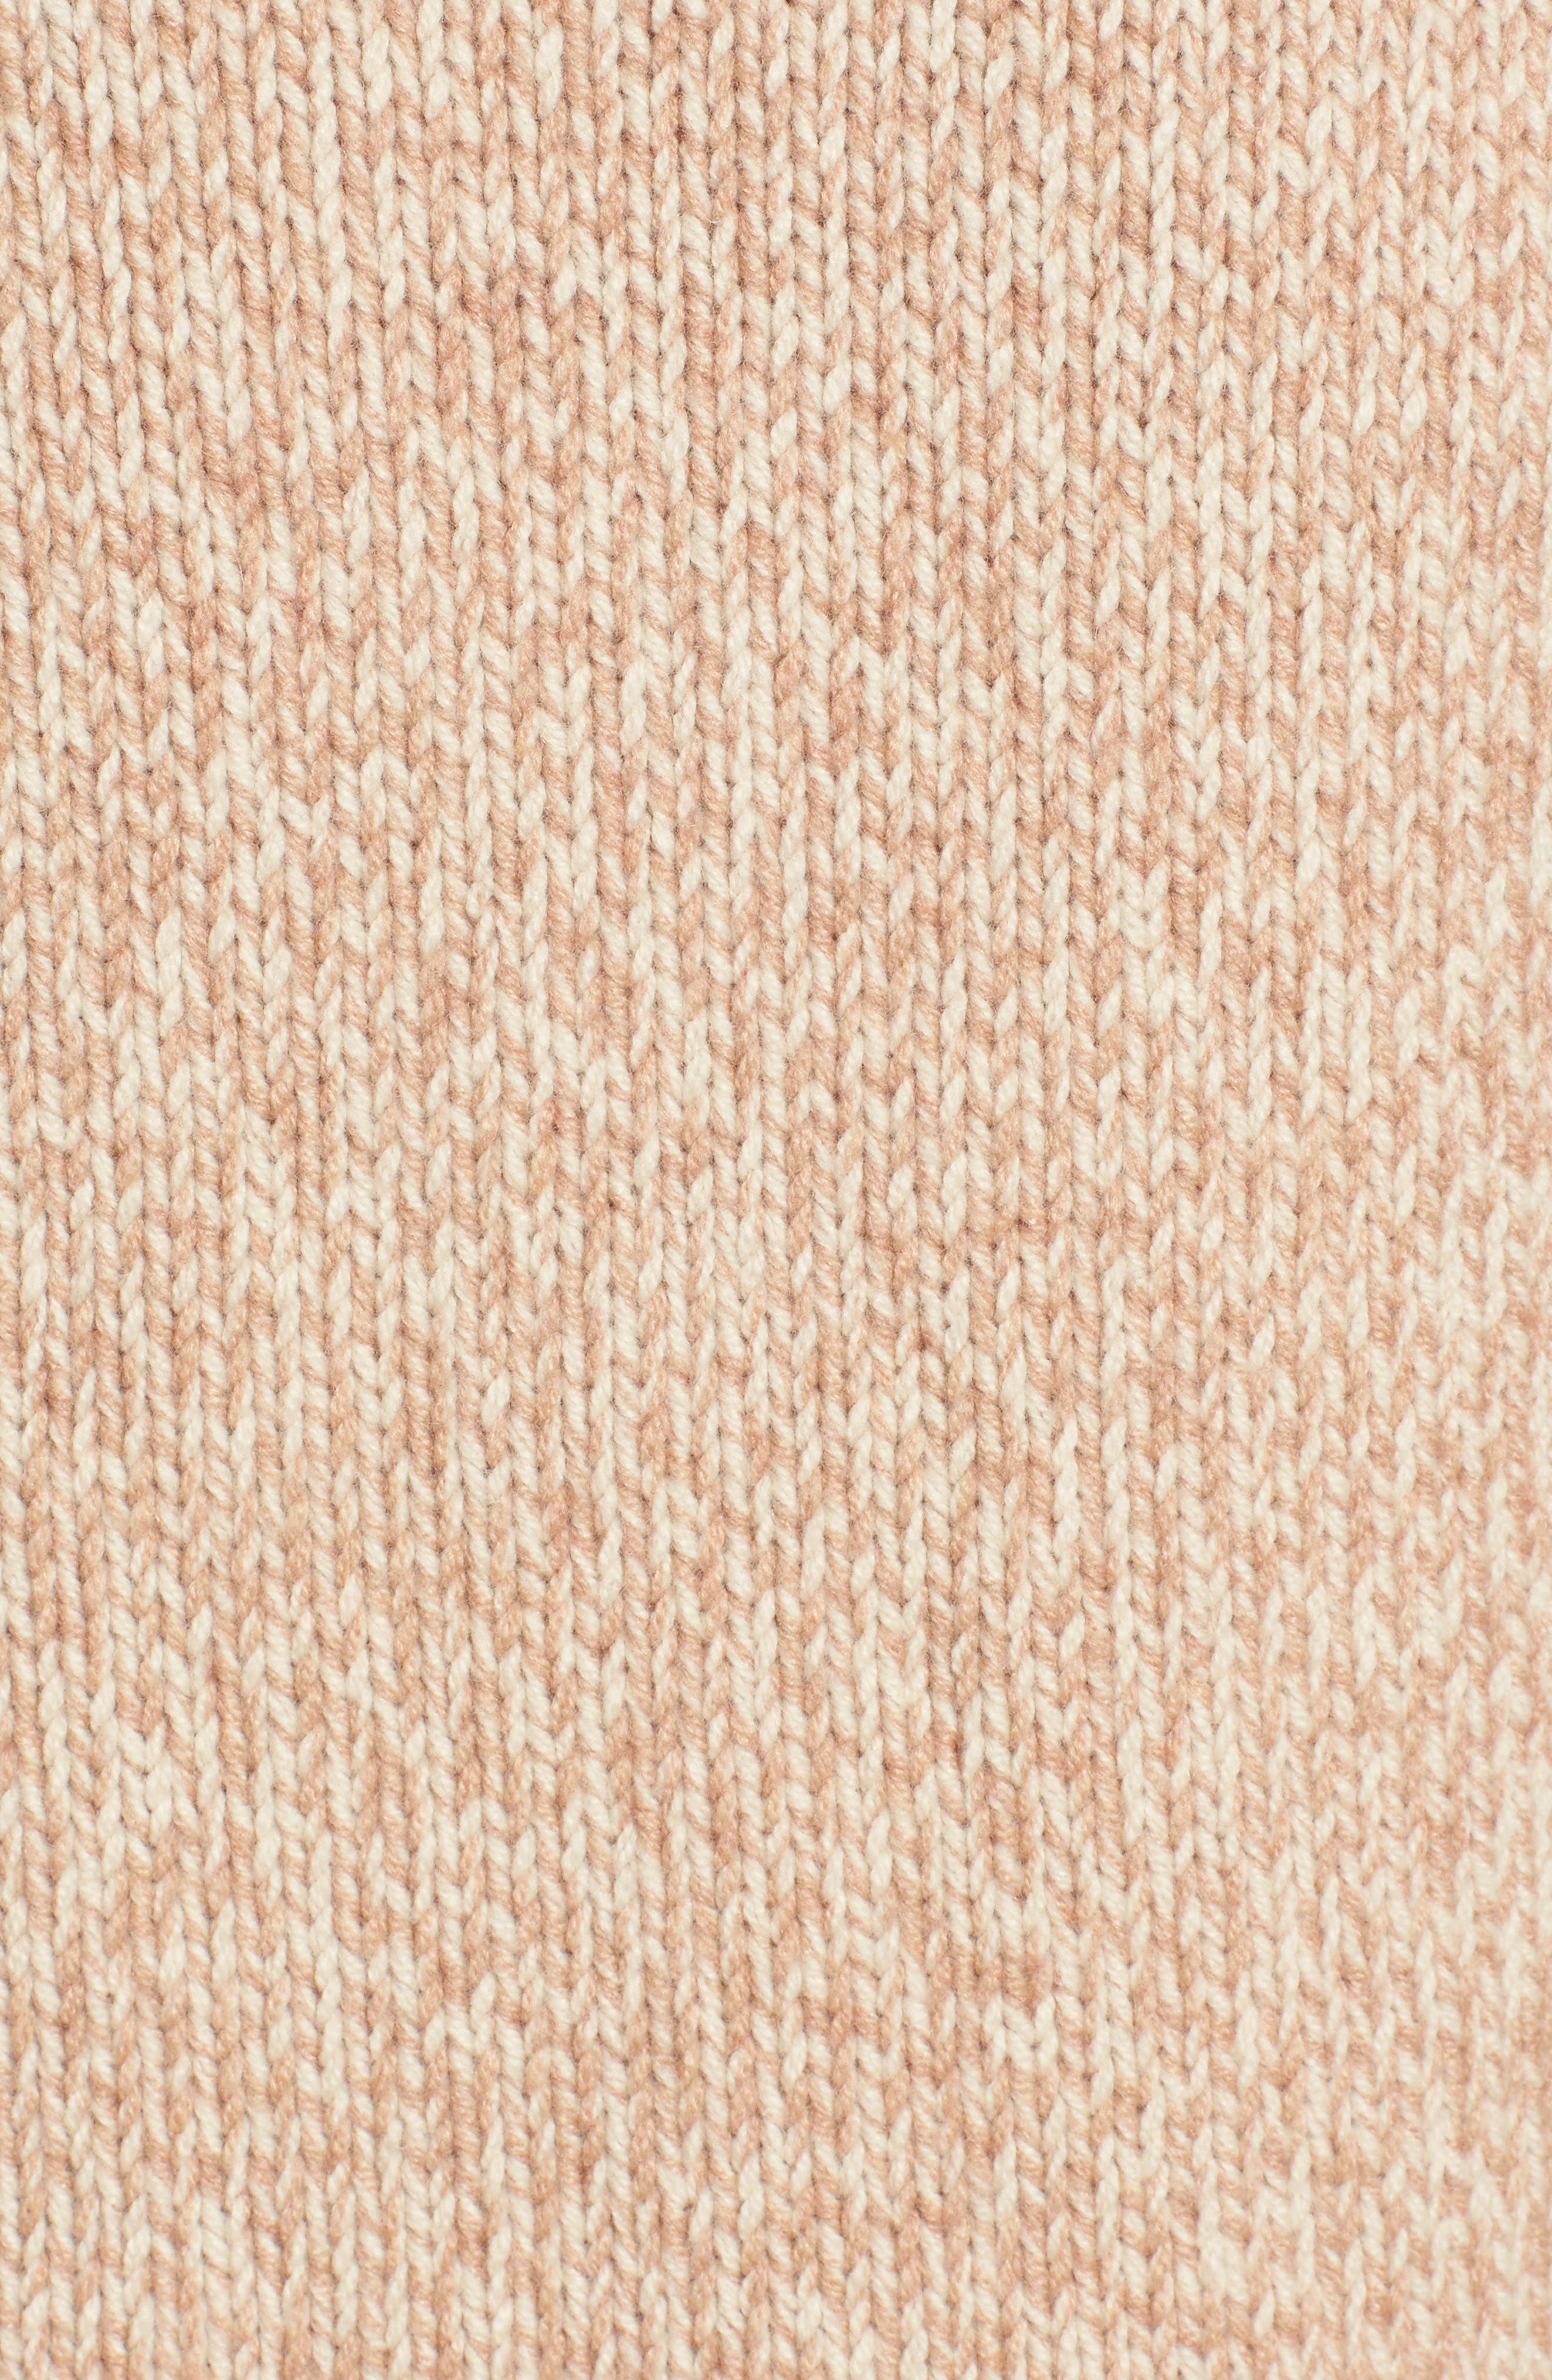 Marled Sleeveless Turtleneck Sweater,                             Alternate thumbnail 5, color,                             201